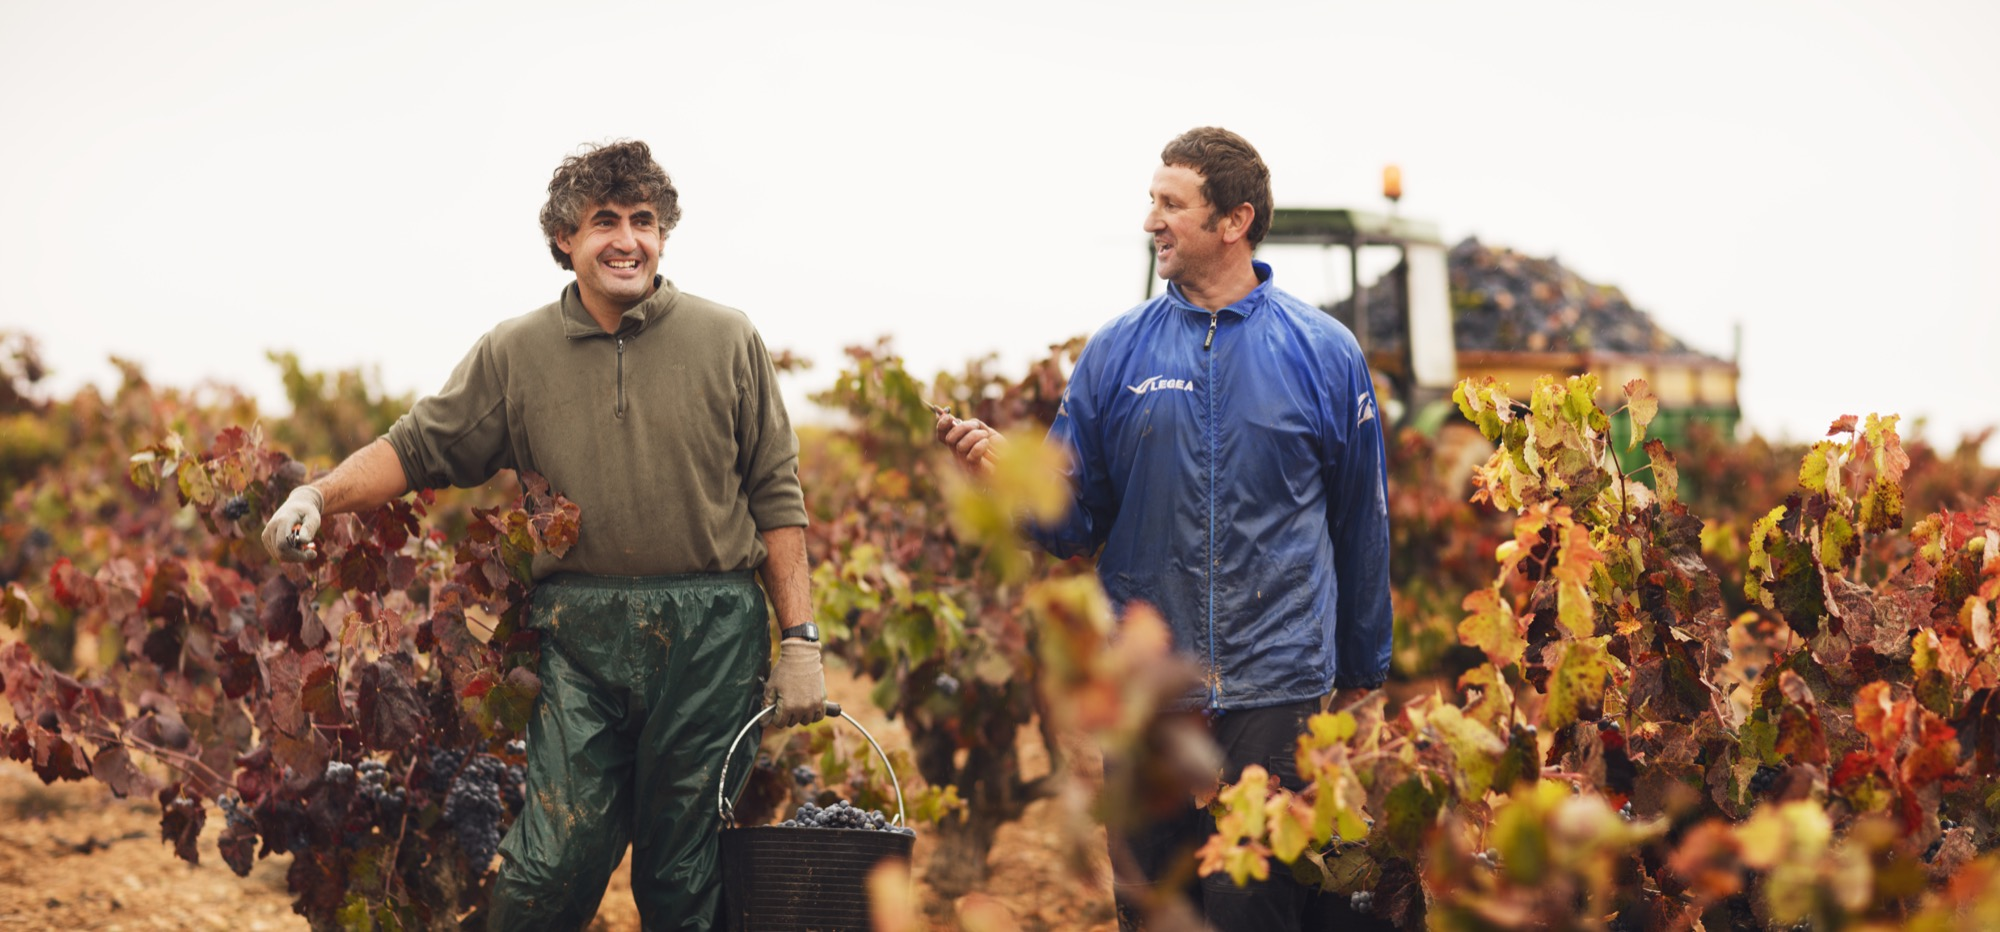 Utiel-Requena recolecta 219 millones de kg de uva